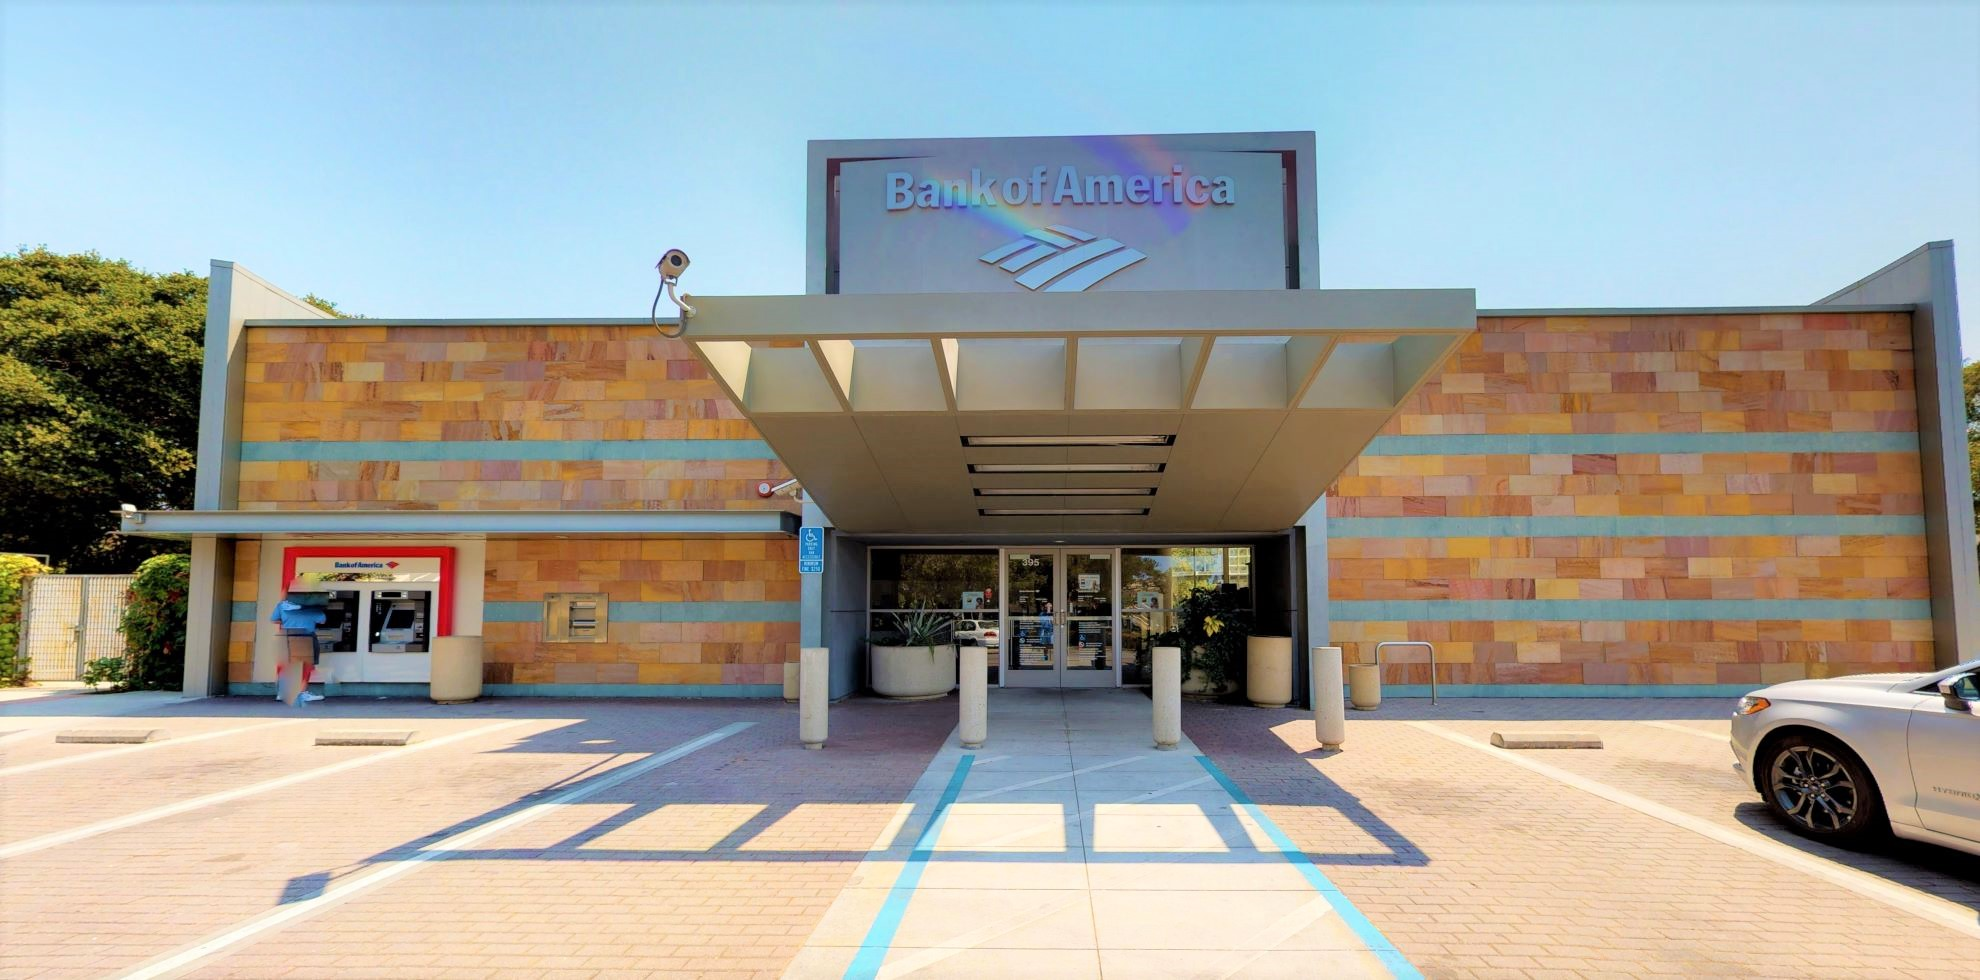 Bank of America financial center with walk-up ATM | 395 Quarry Rd, Palo Alto, CA 94304